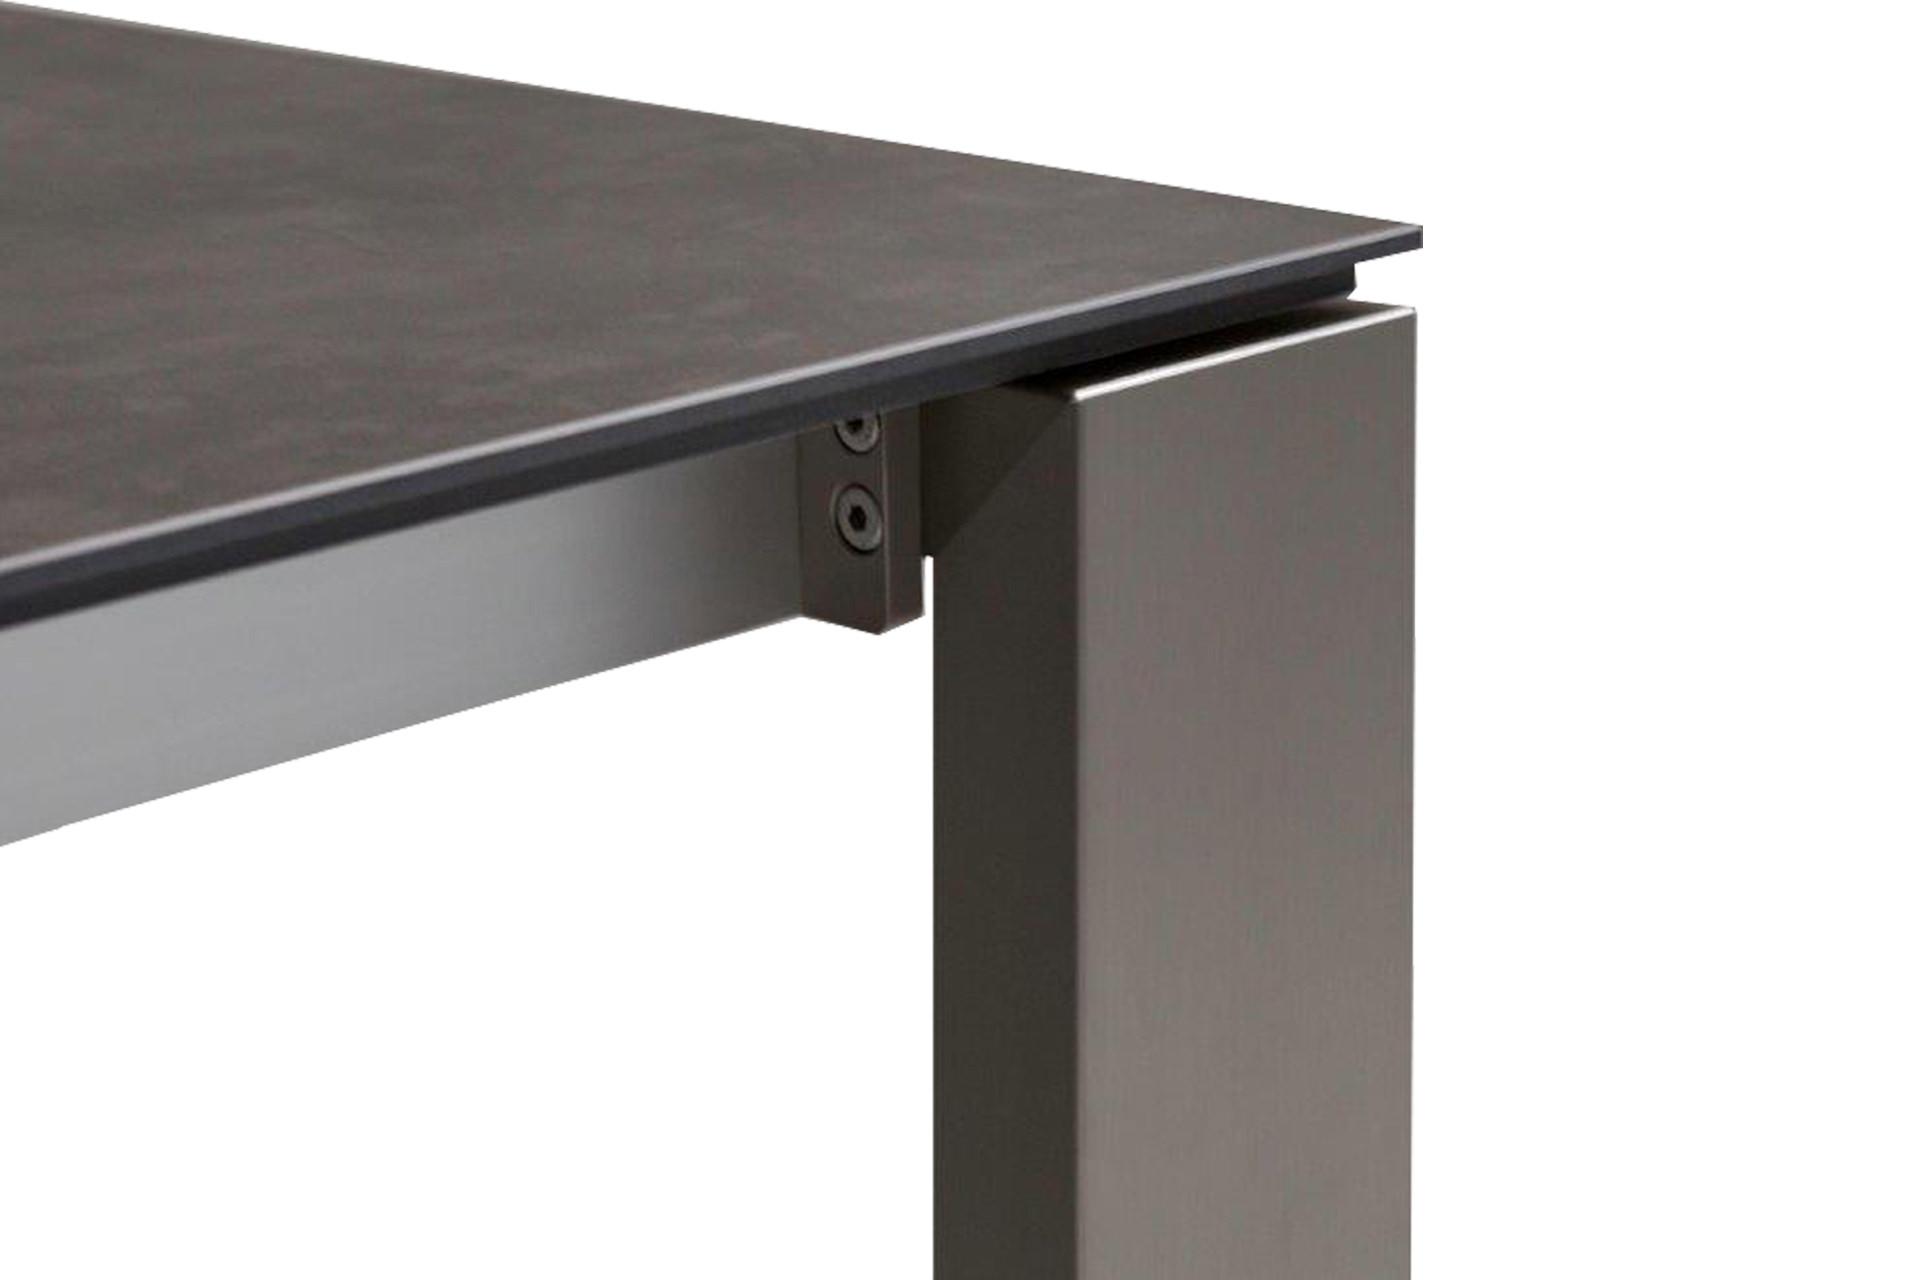 Designer Gartentisch Aluminium HPL Tischkante